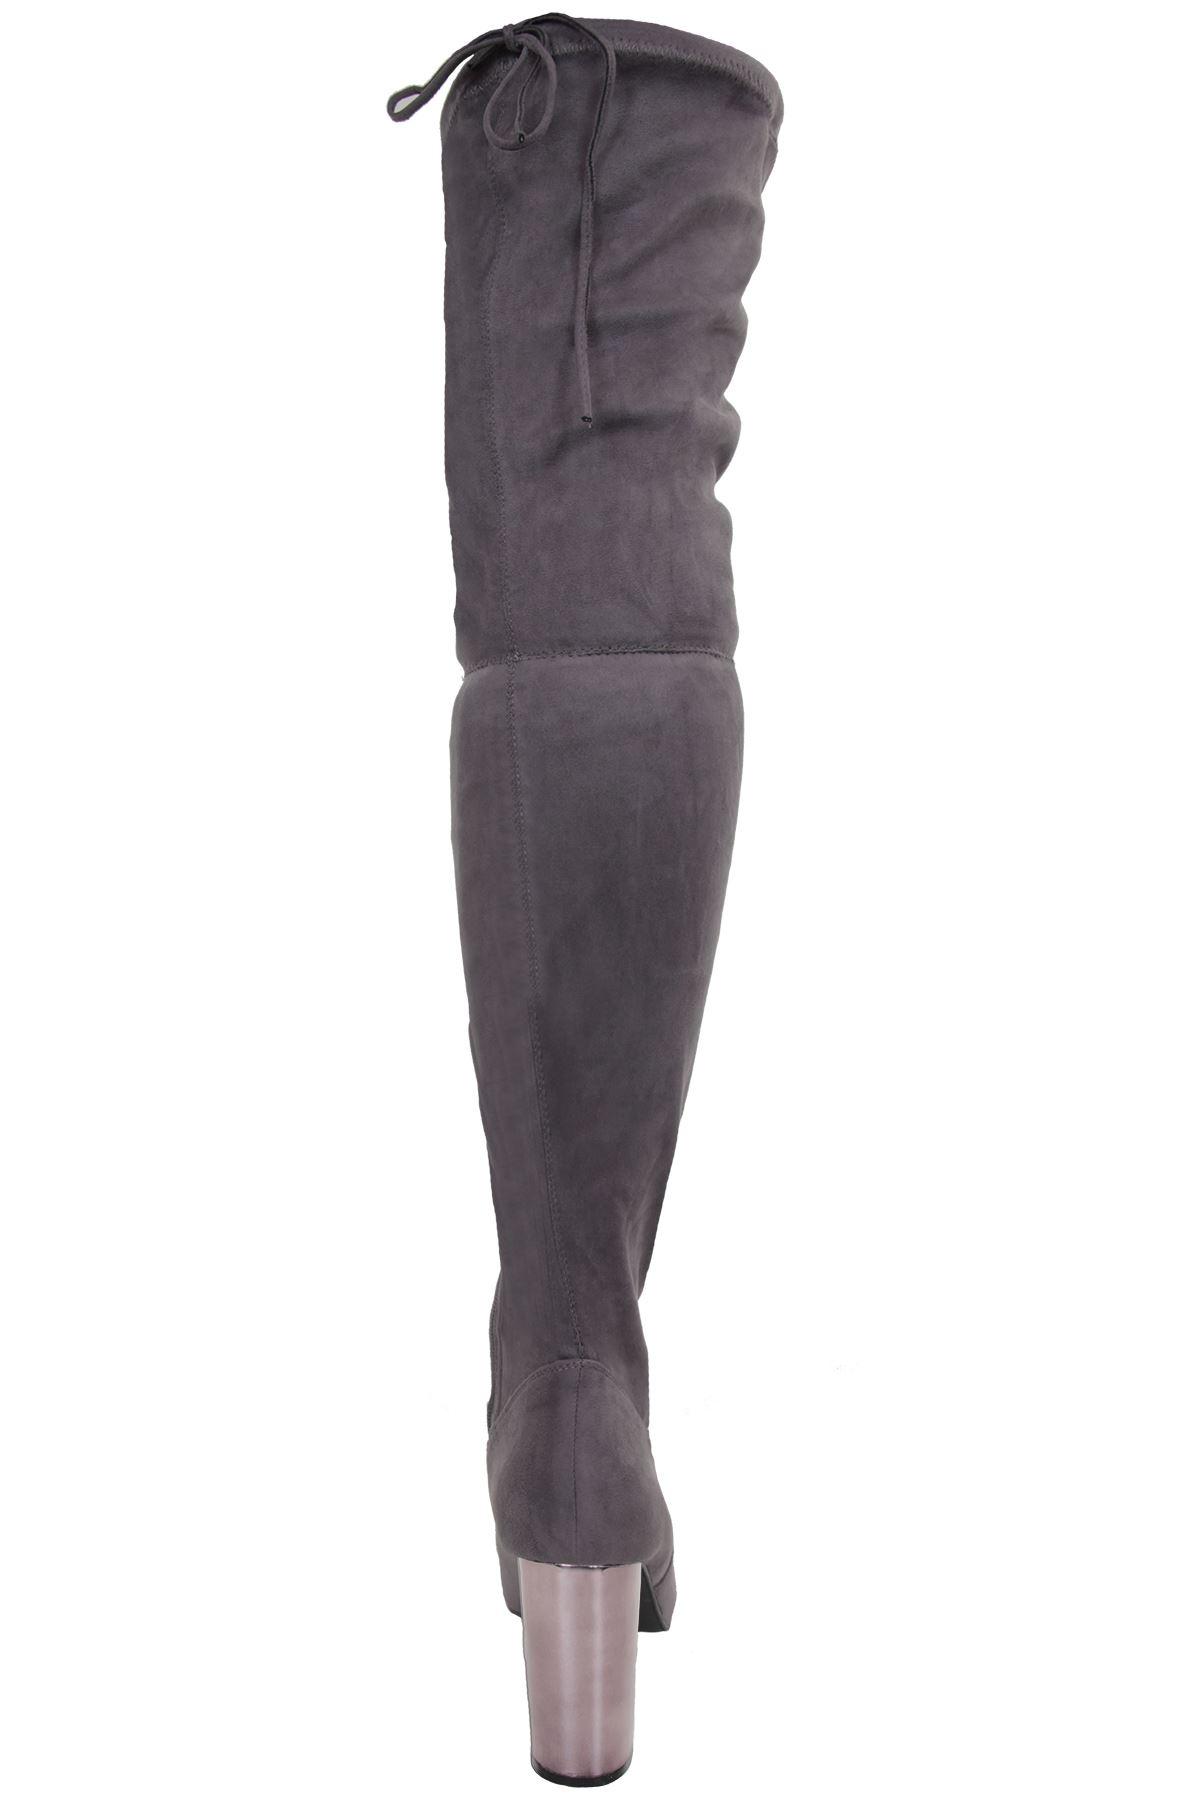 Damen Overknee grob hoch schenkelhoch metallisch Block grob Overknee Absatz Wildleder Stiefel 8e7360